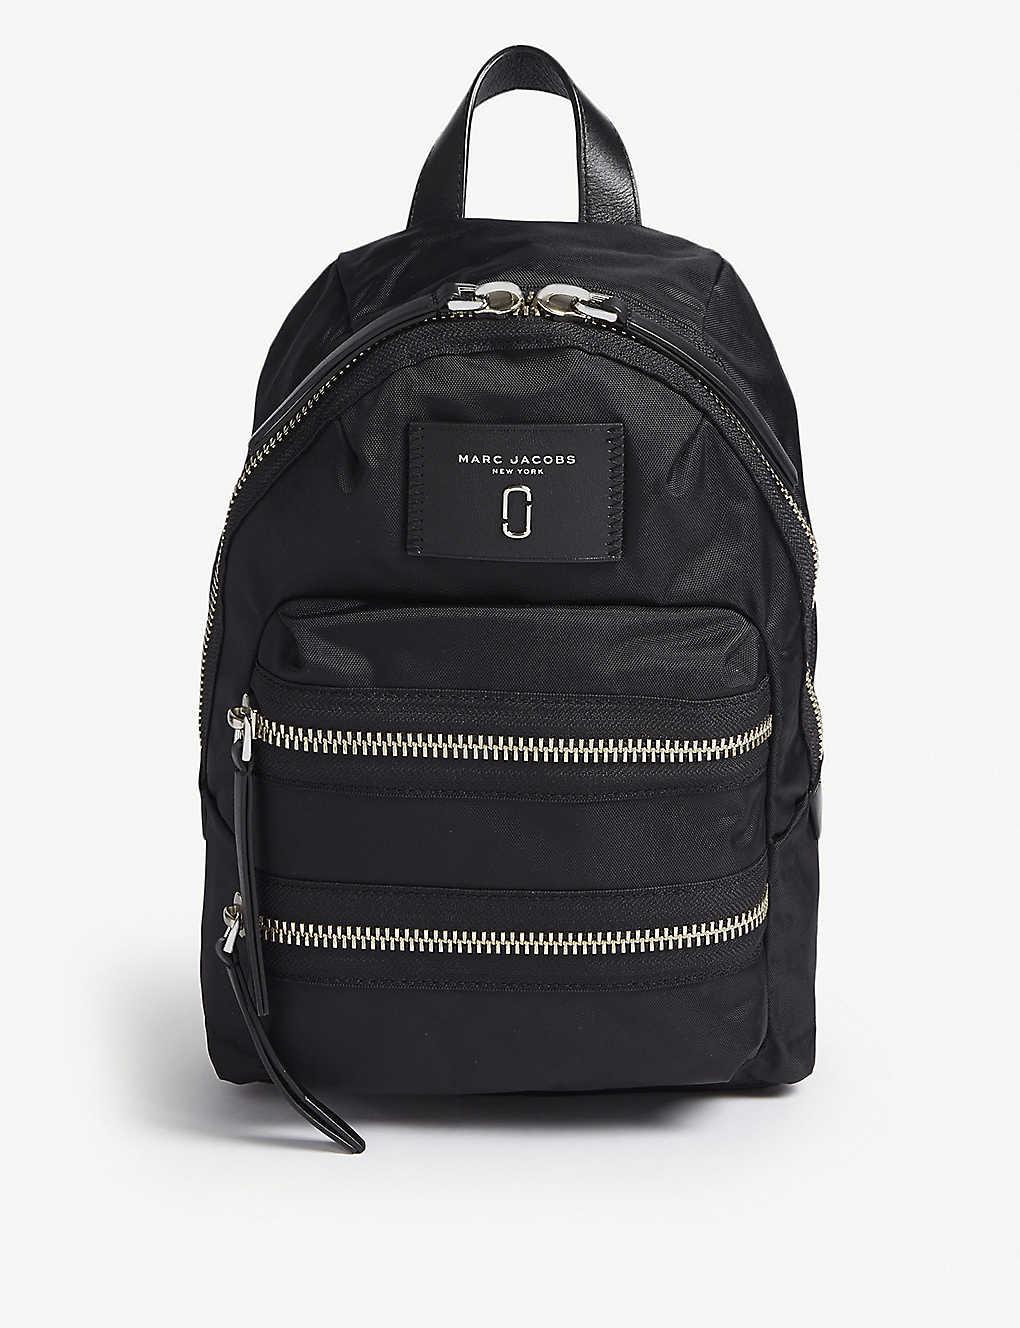 MARC JACOBS - Biker nylon mini backpack | Selfridges.com